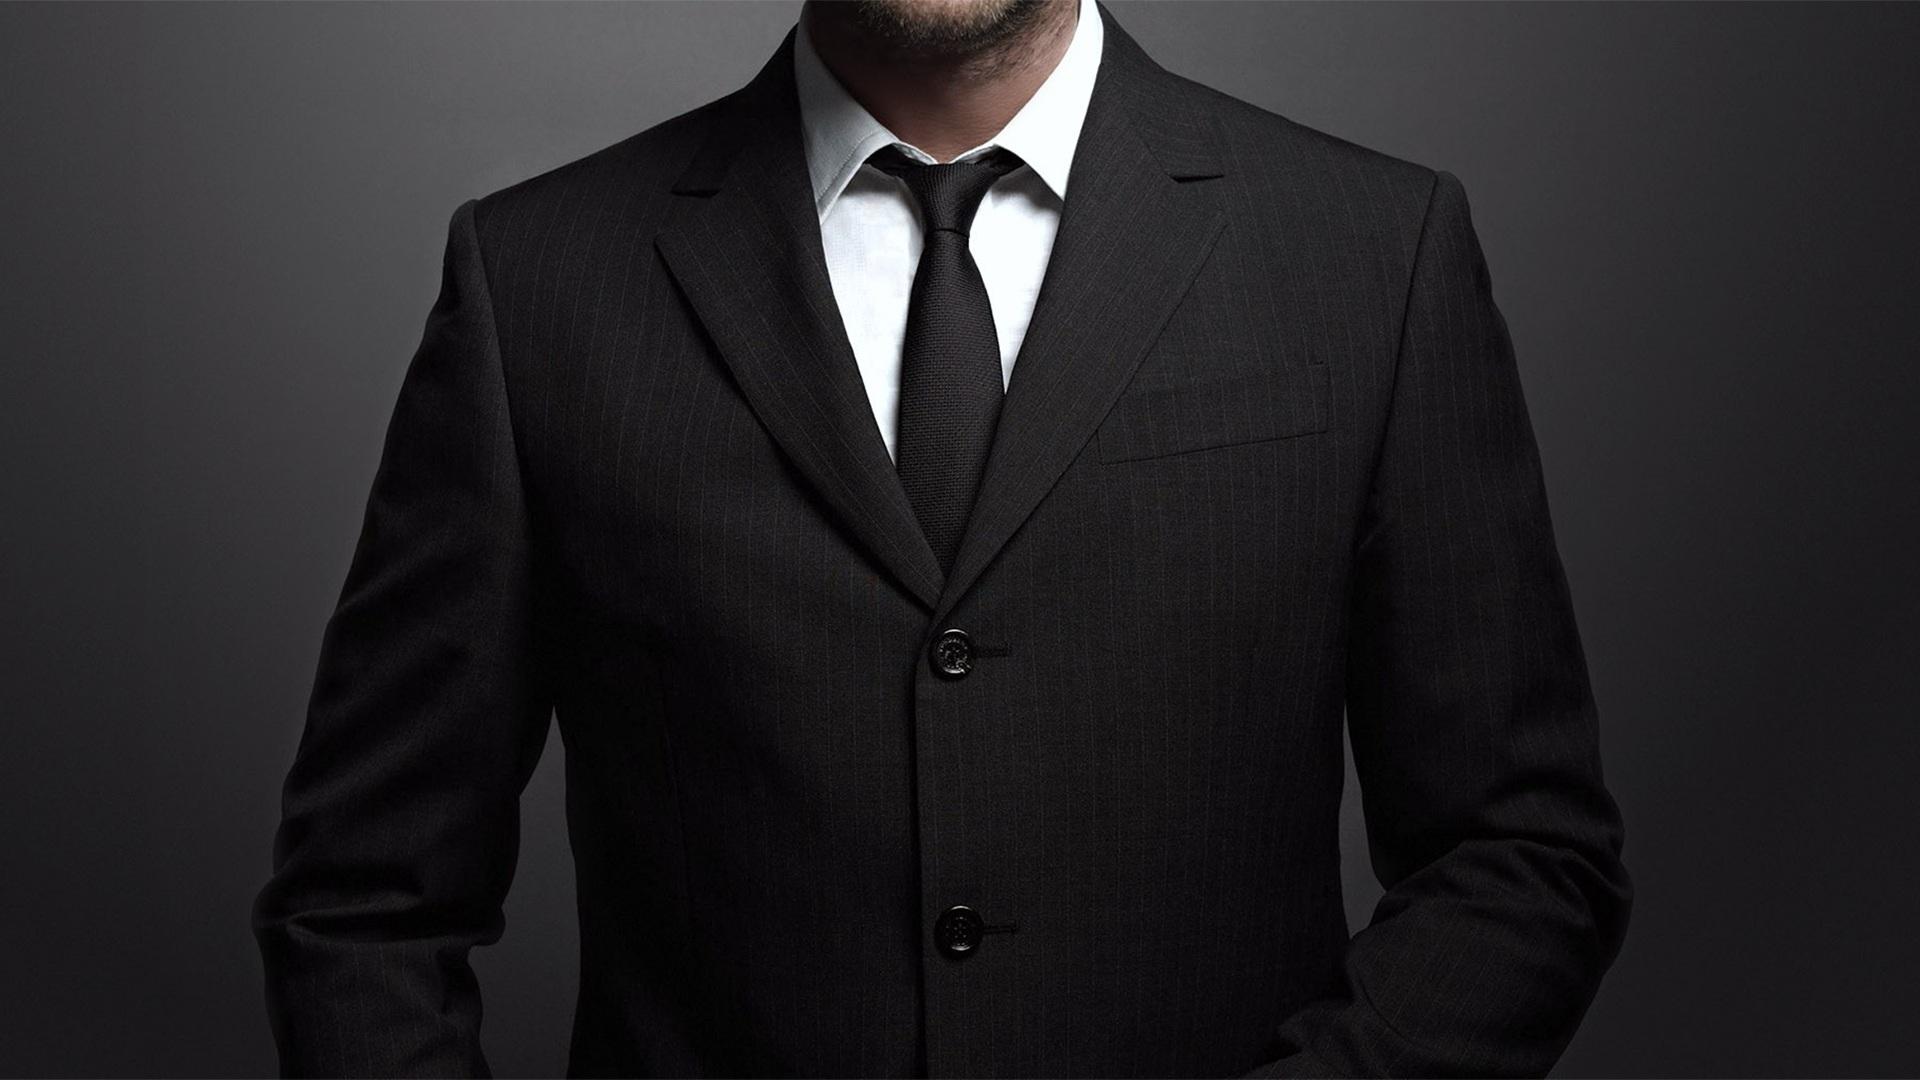 free suit wallpaper 43105